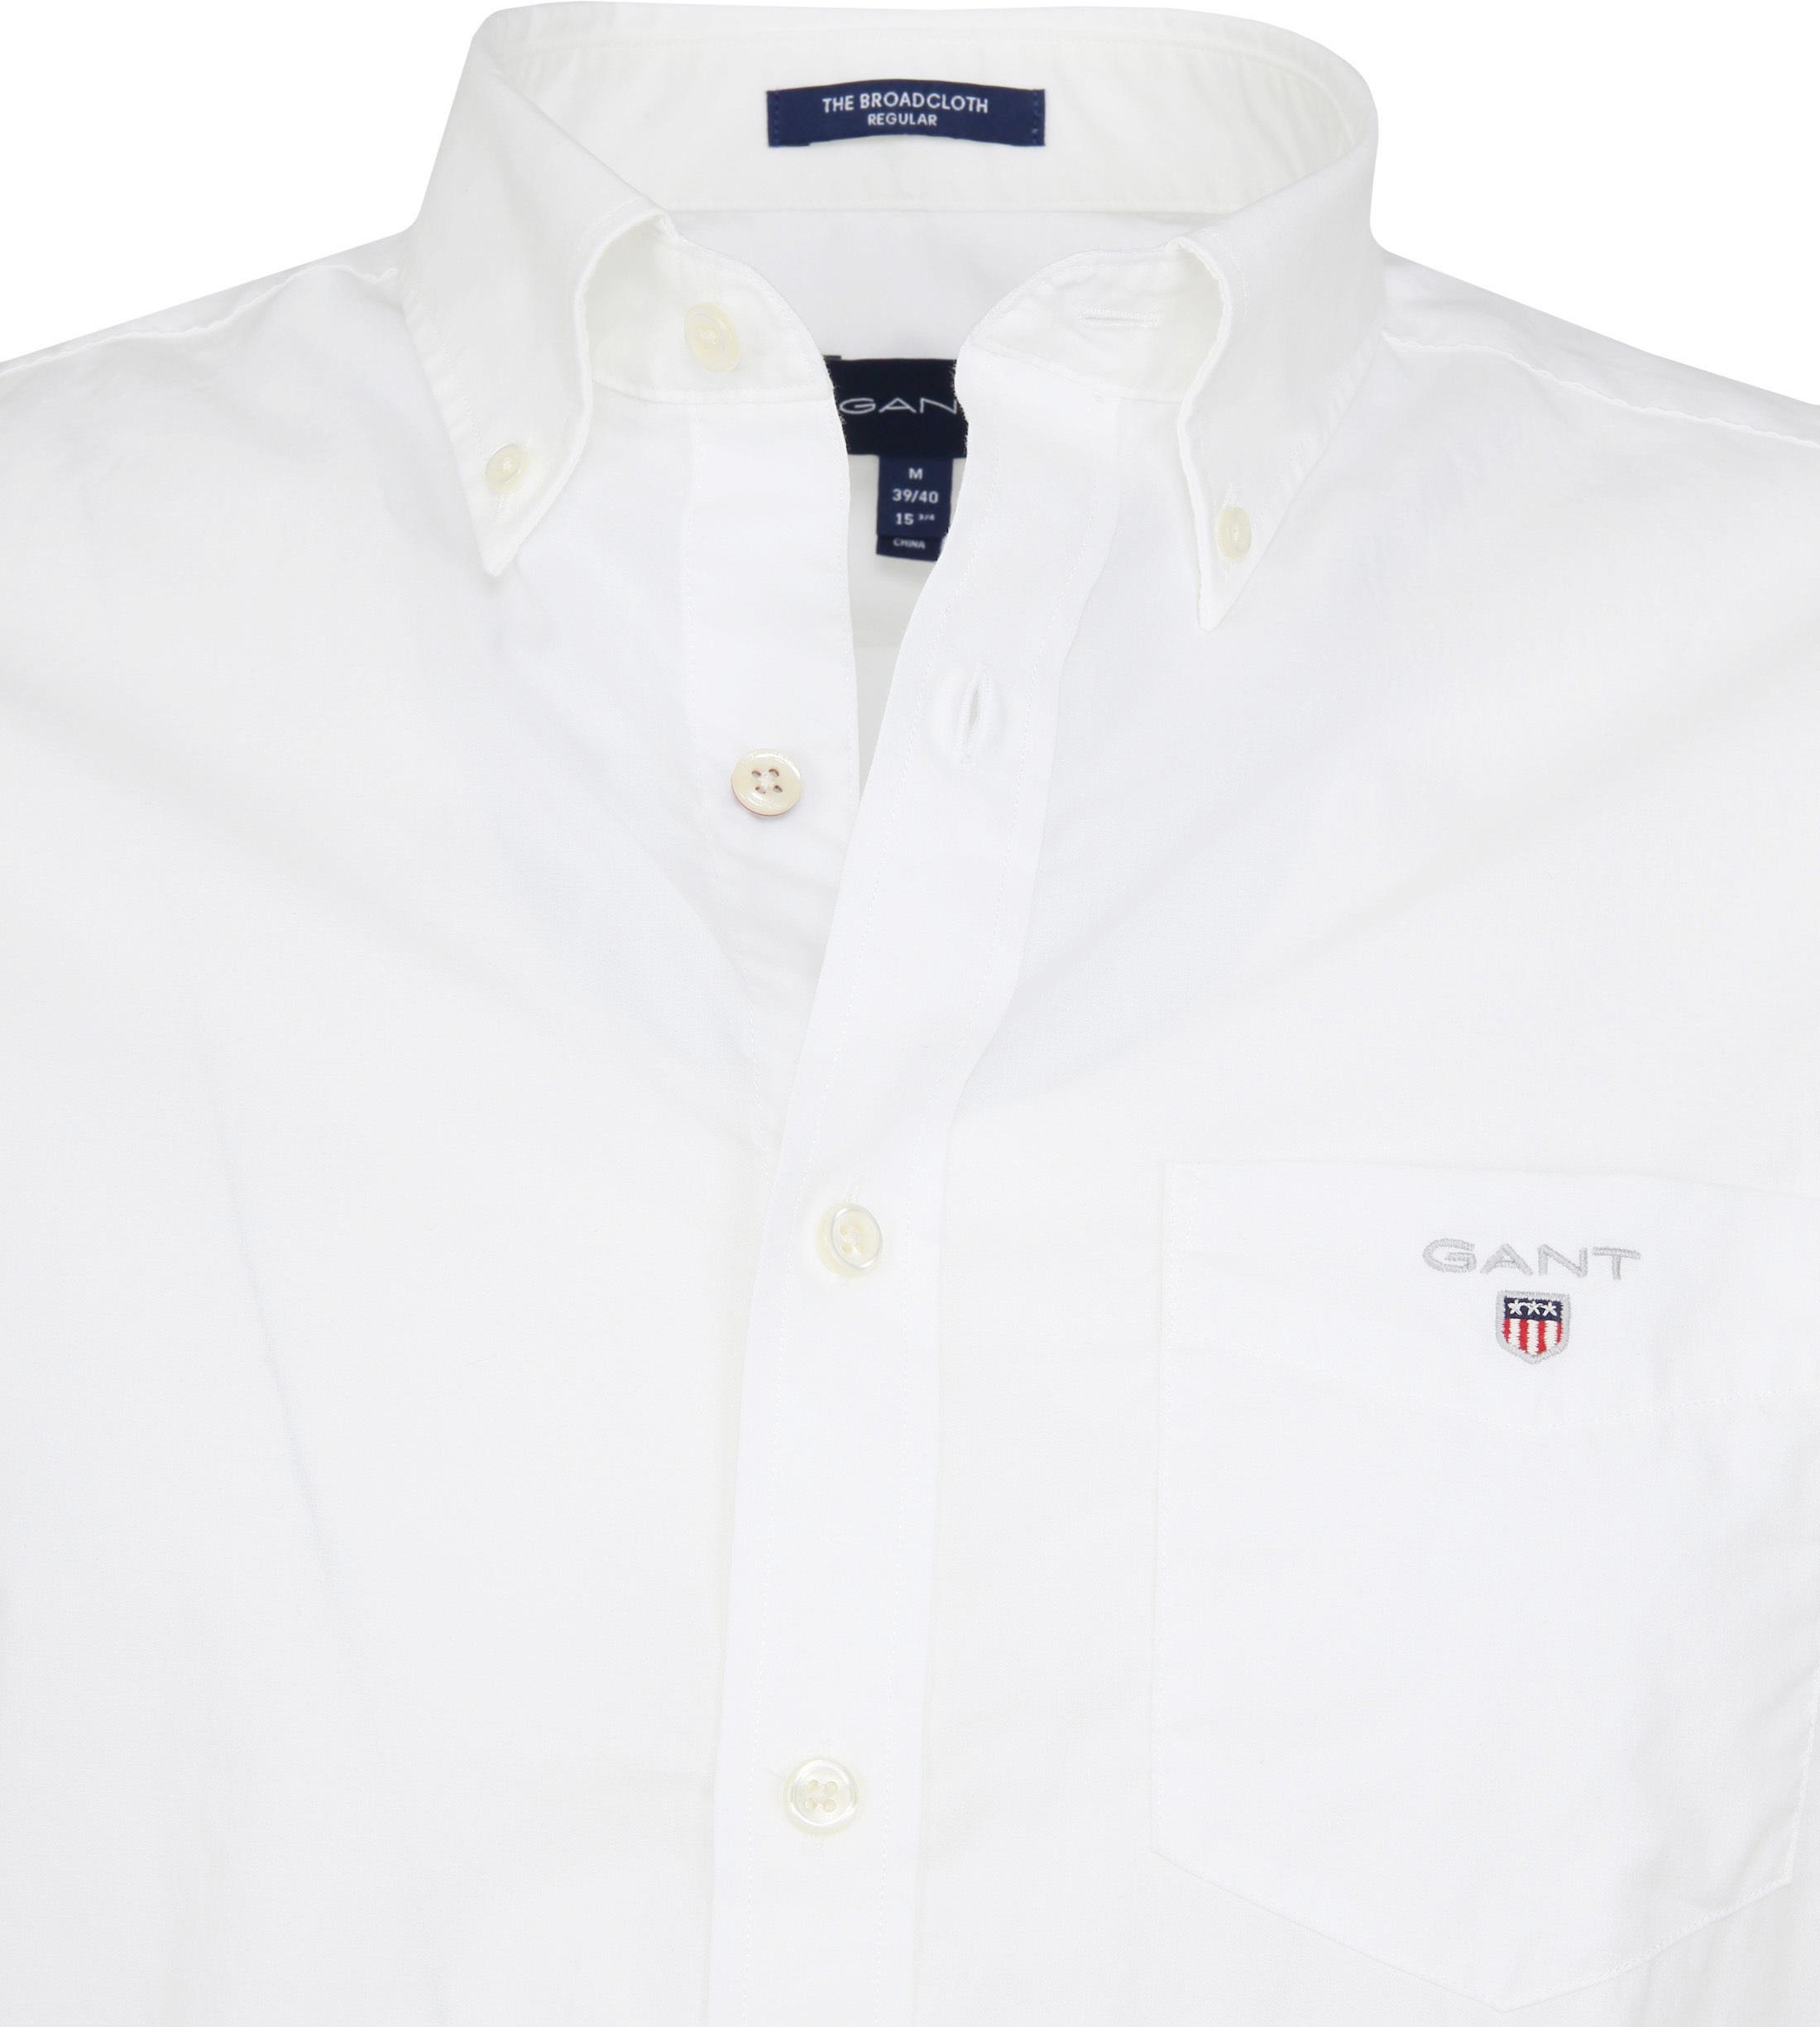 Gant Overhemd SS Broadcloth Wit foto 1